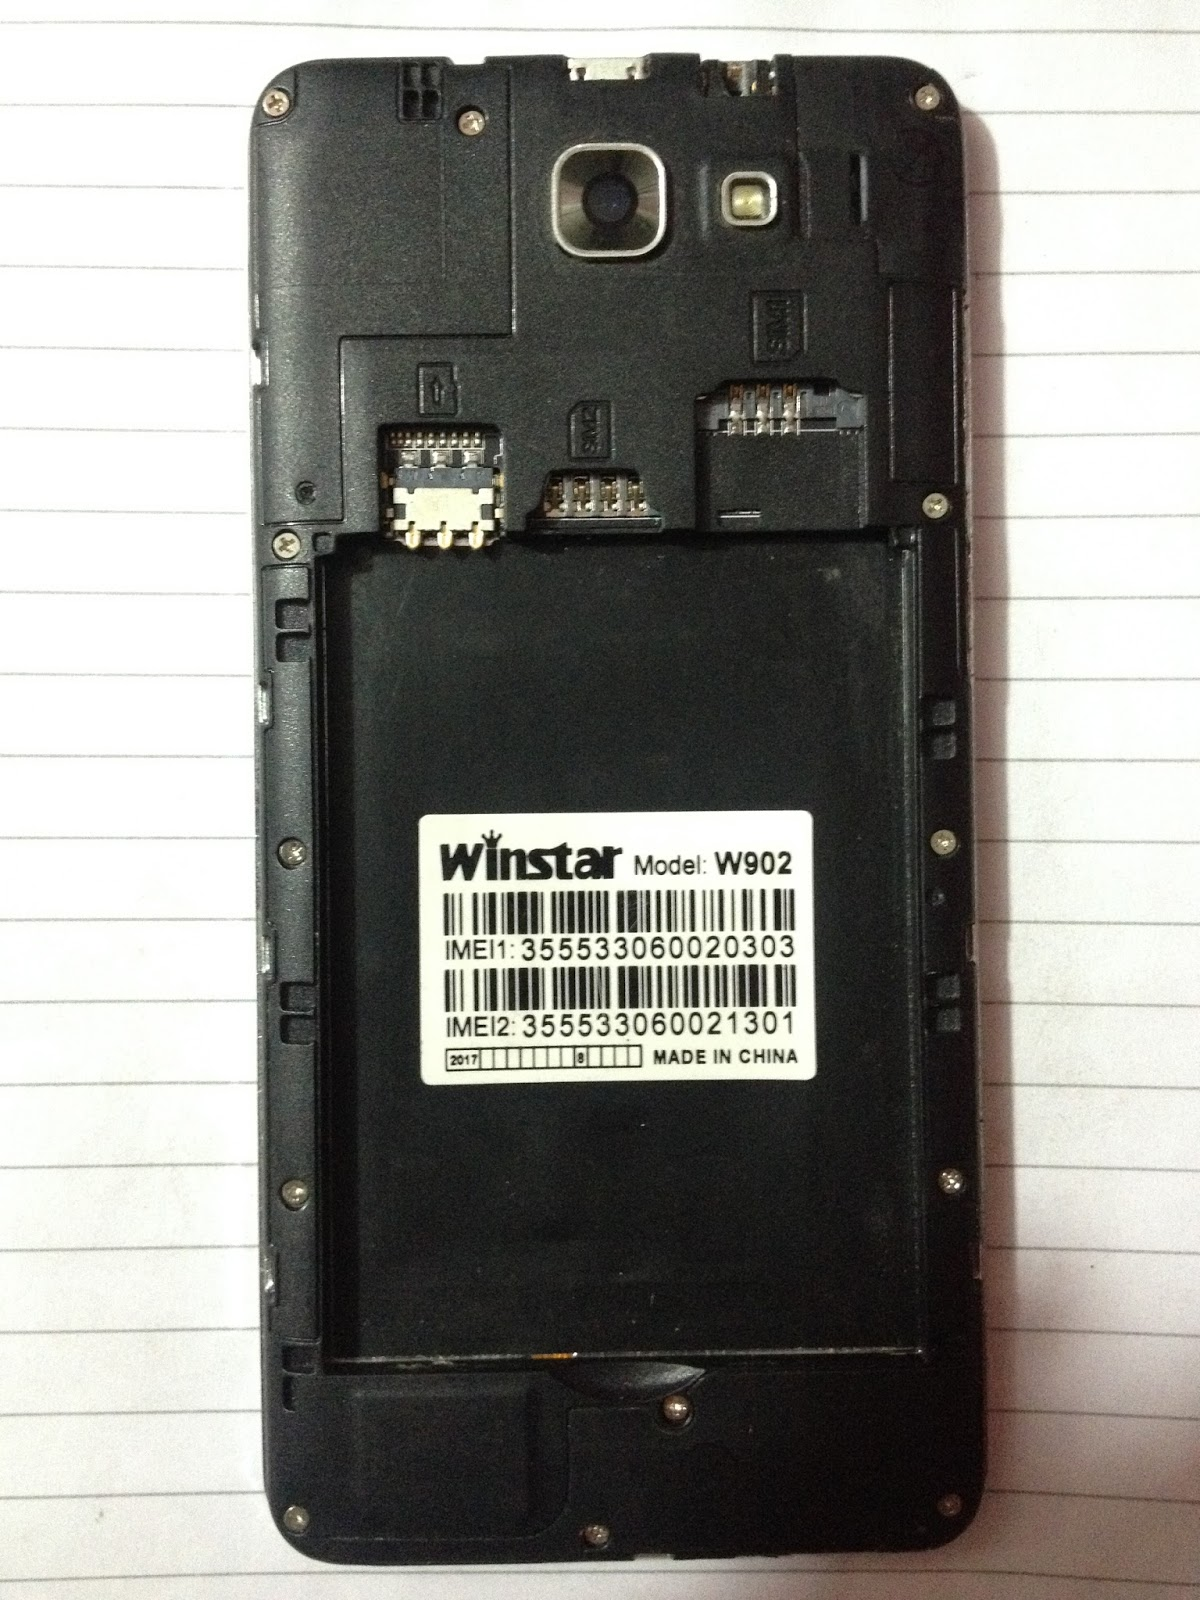 Winstar W902 Flash File Free Download